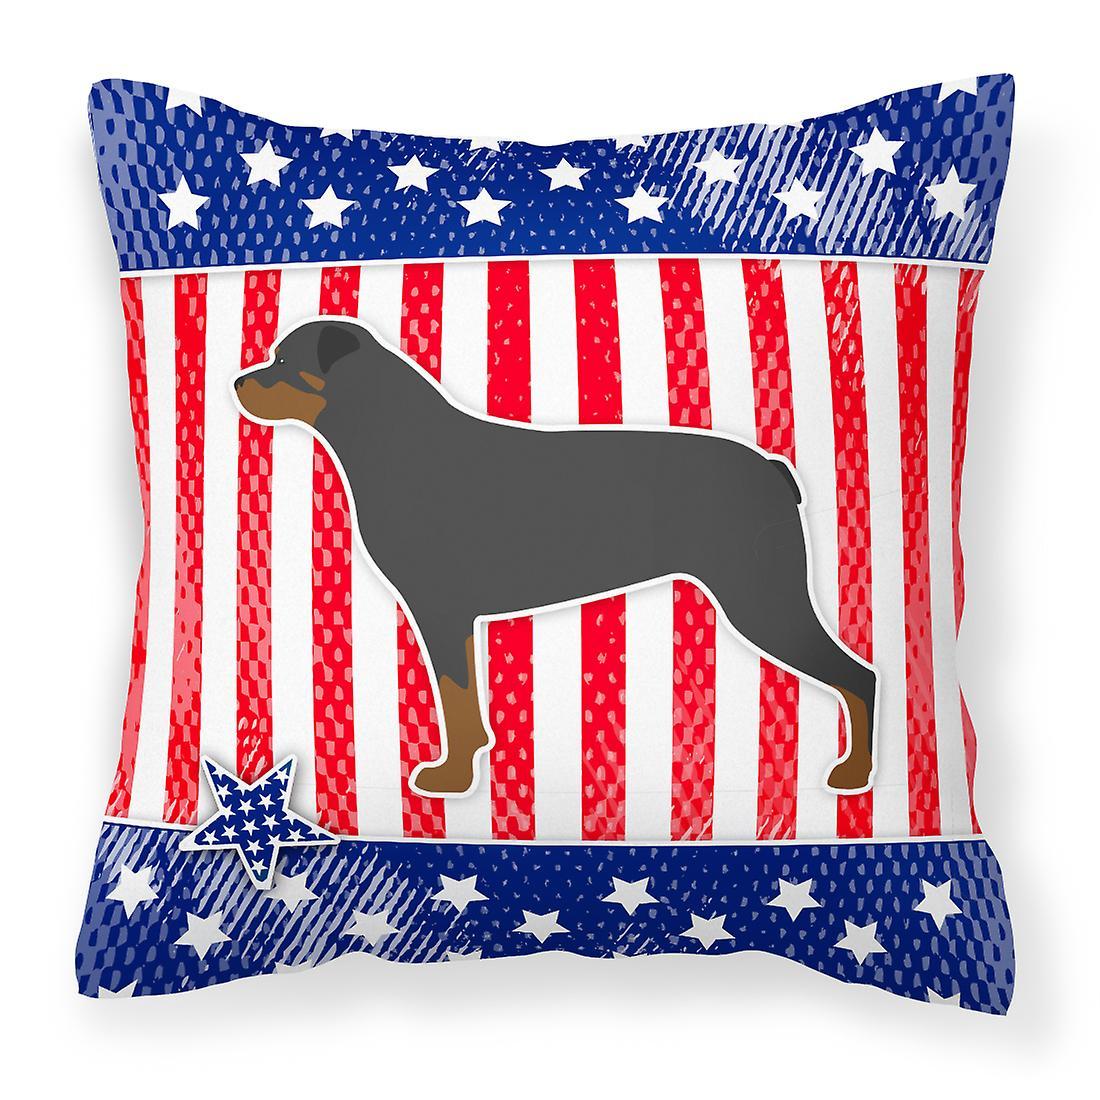 Patriotique De Usa Tissu Oreiller Décoratif Rottweiler 7gfy6bvY